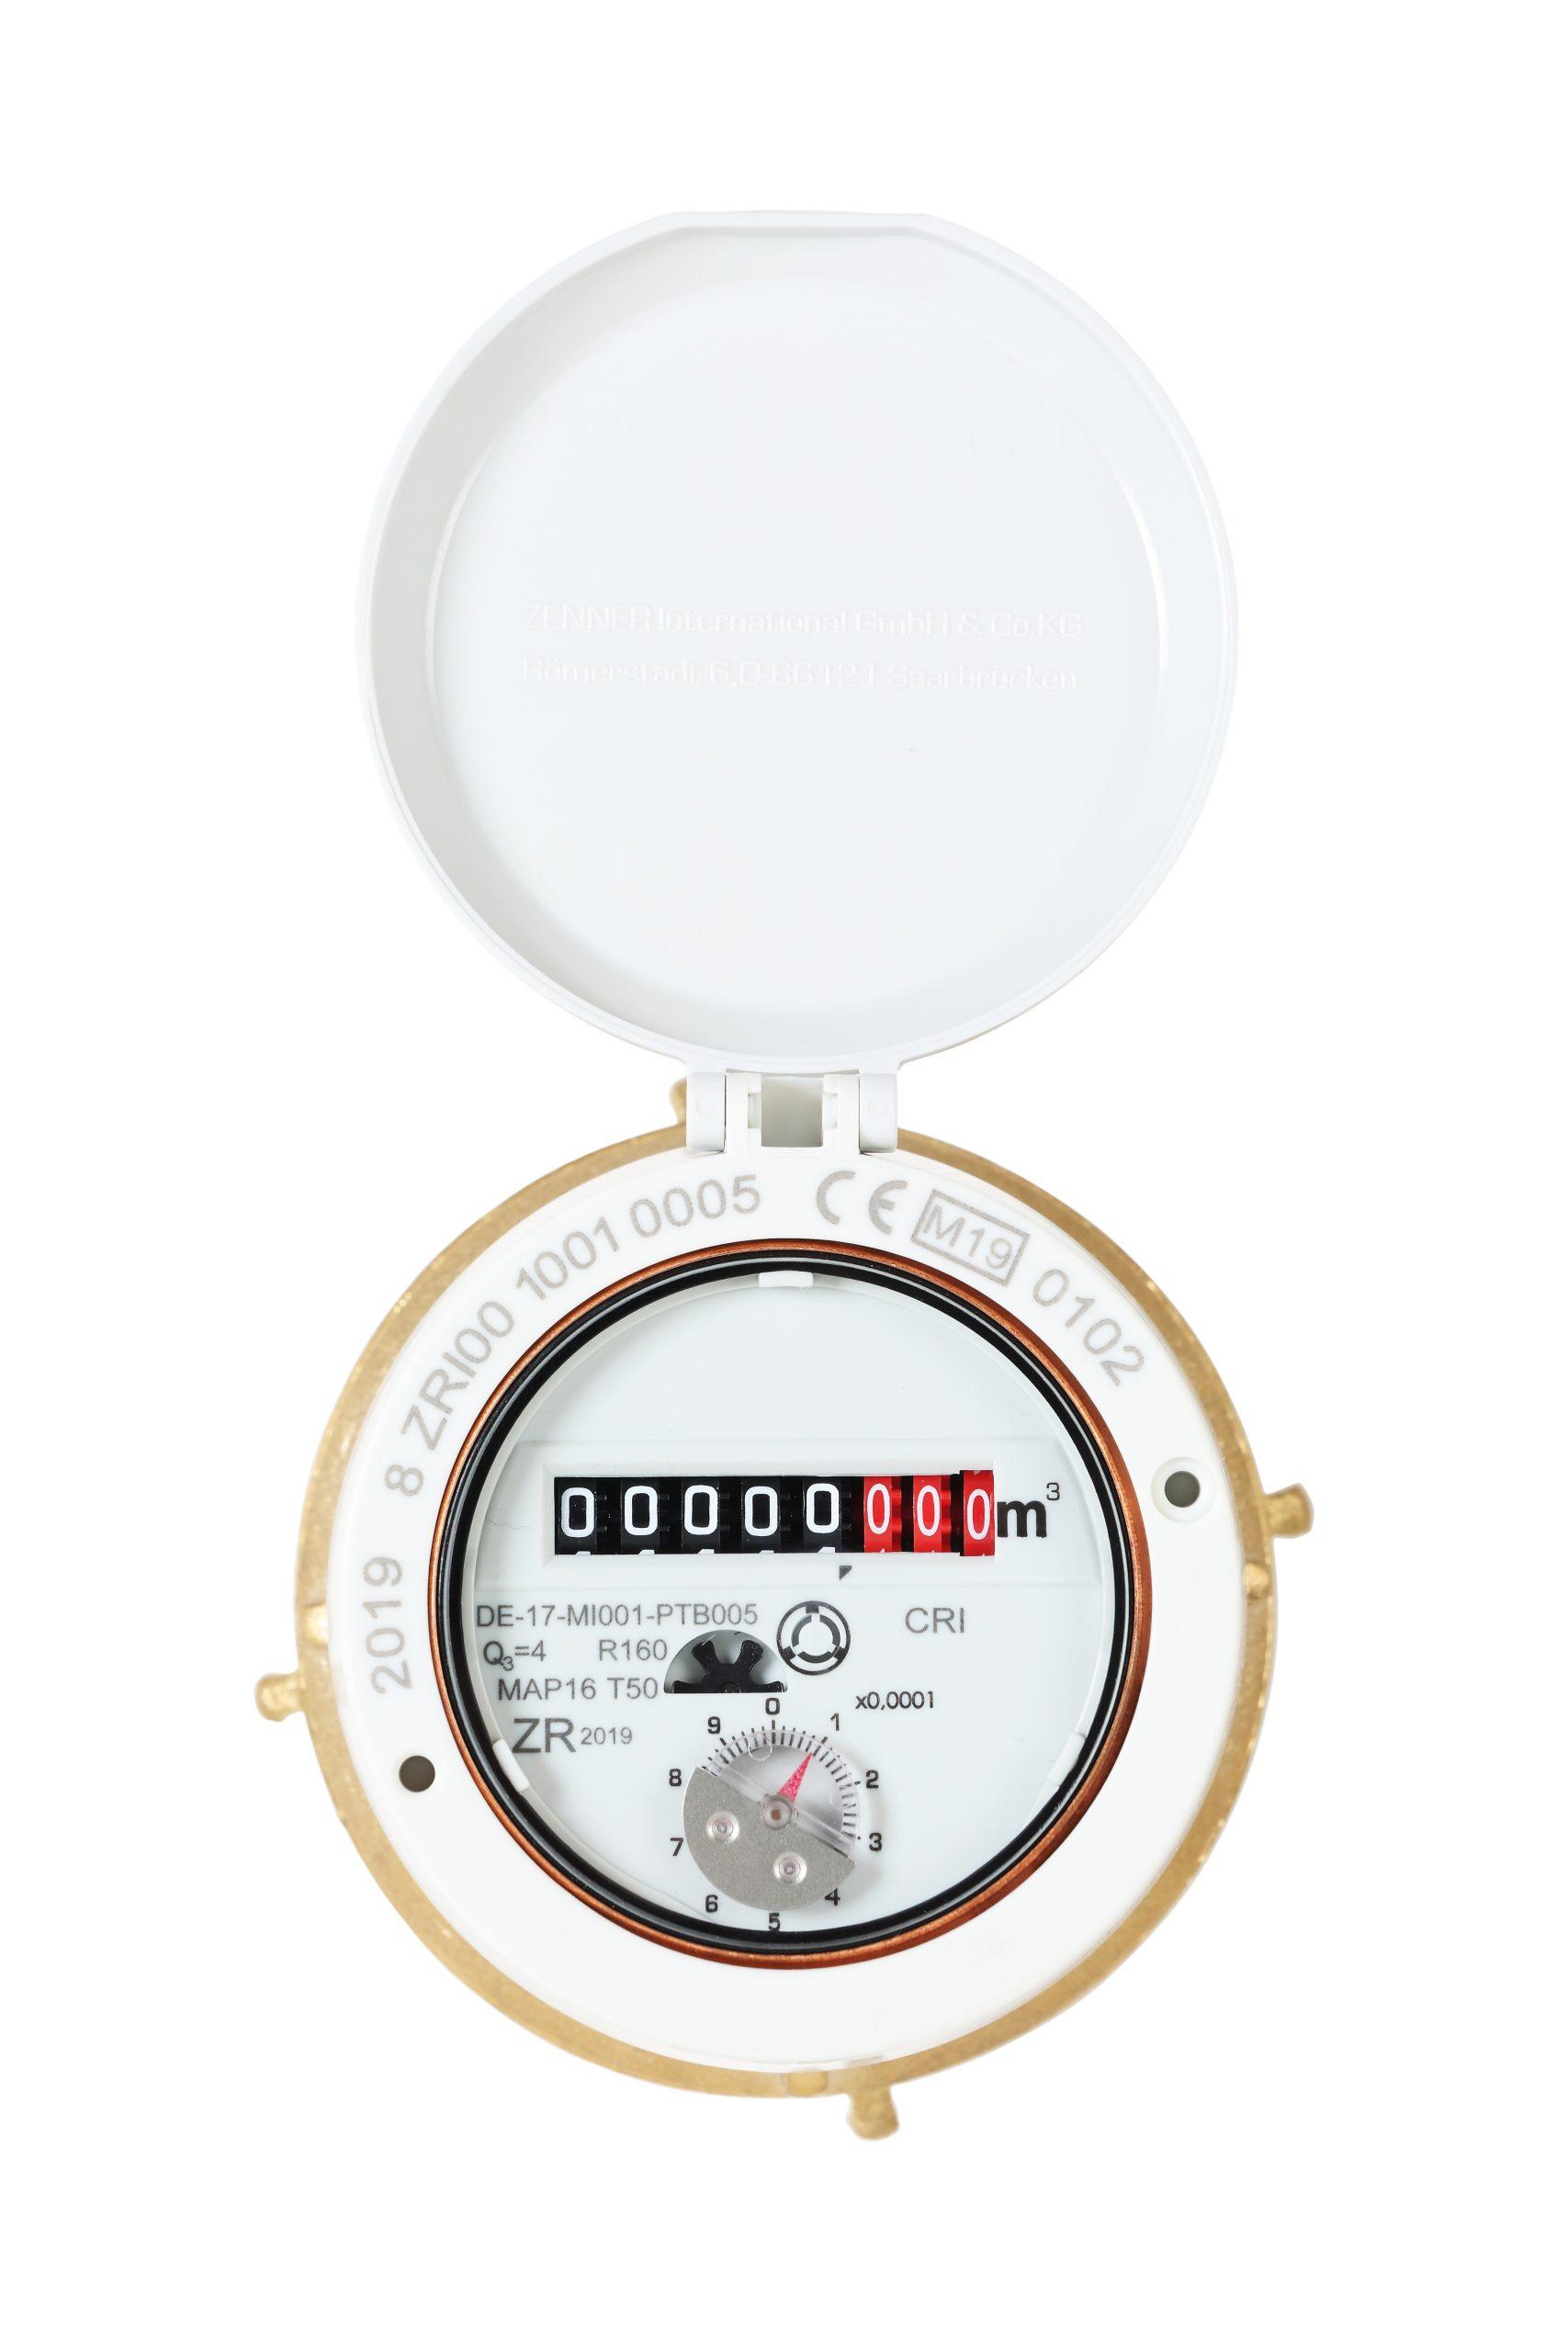 Positive displacement water meter RTKD-MF